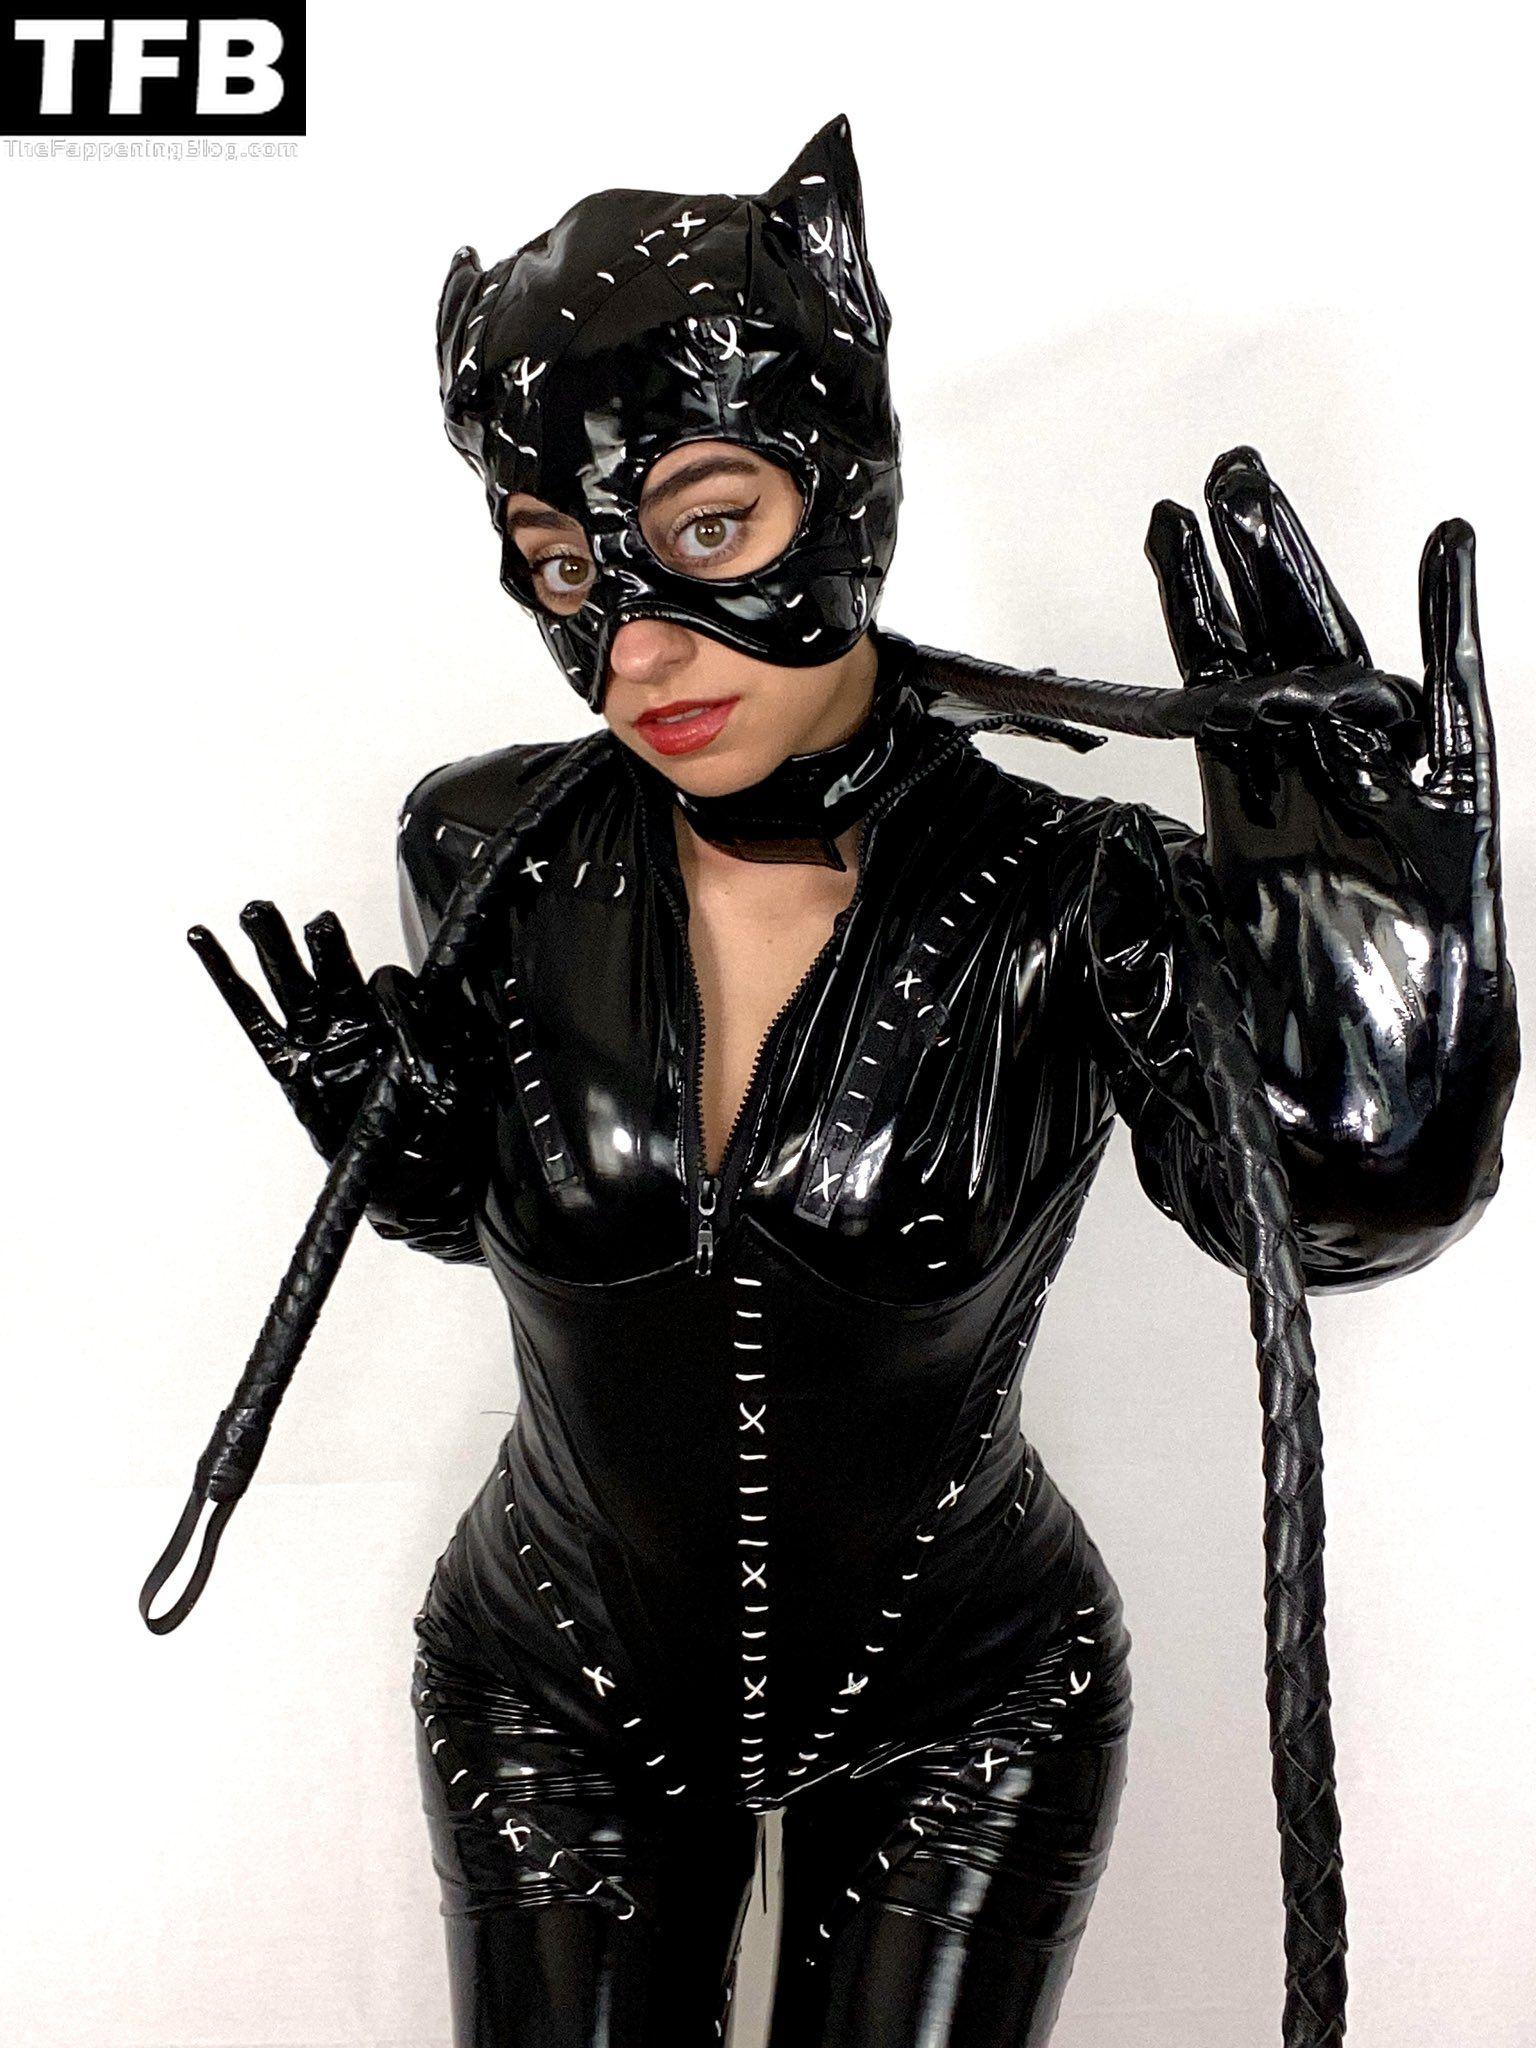 Léa-Martinez-Sexy-1-thefappeningblog.com_.jpg